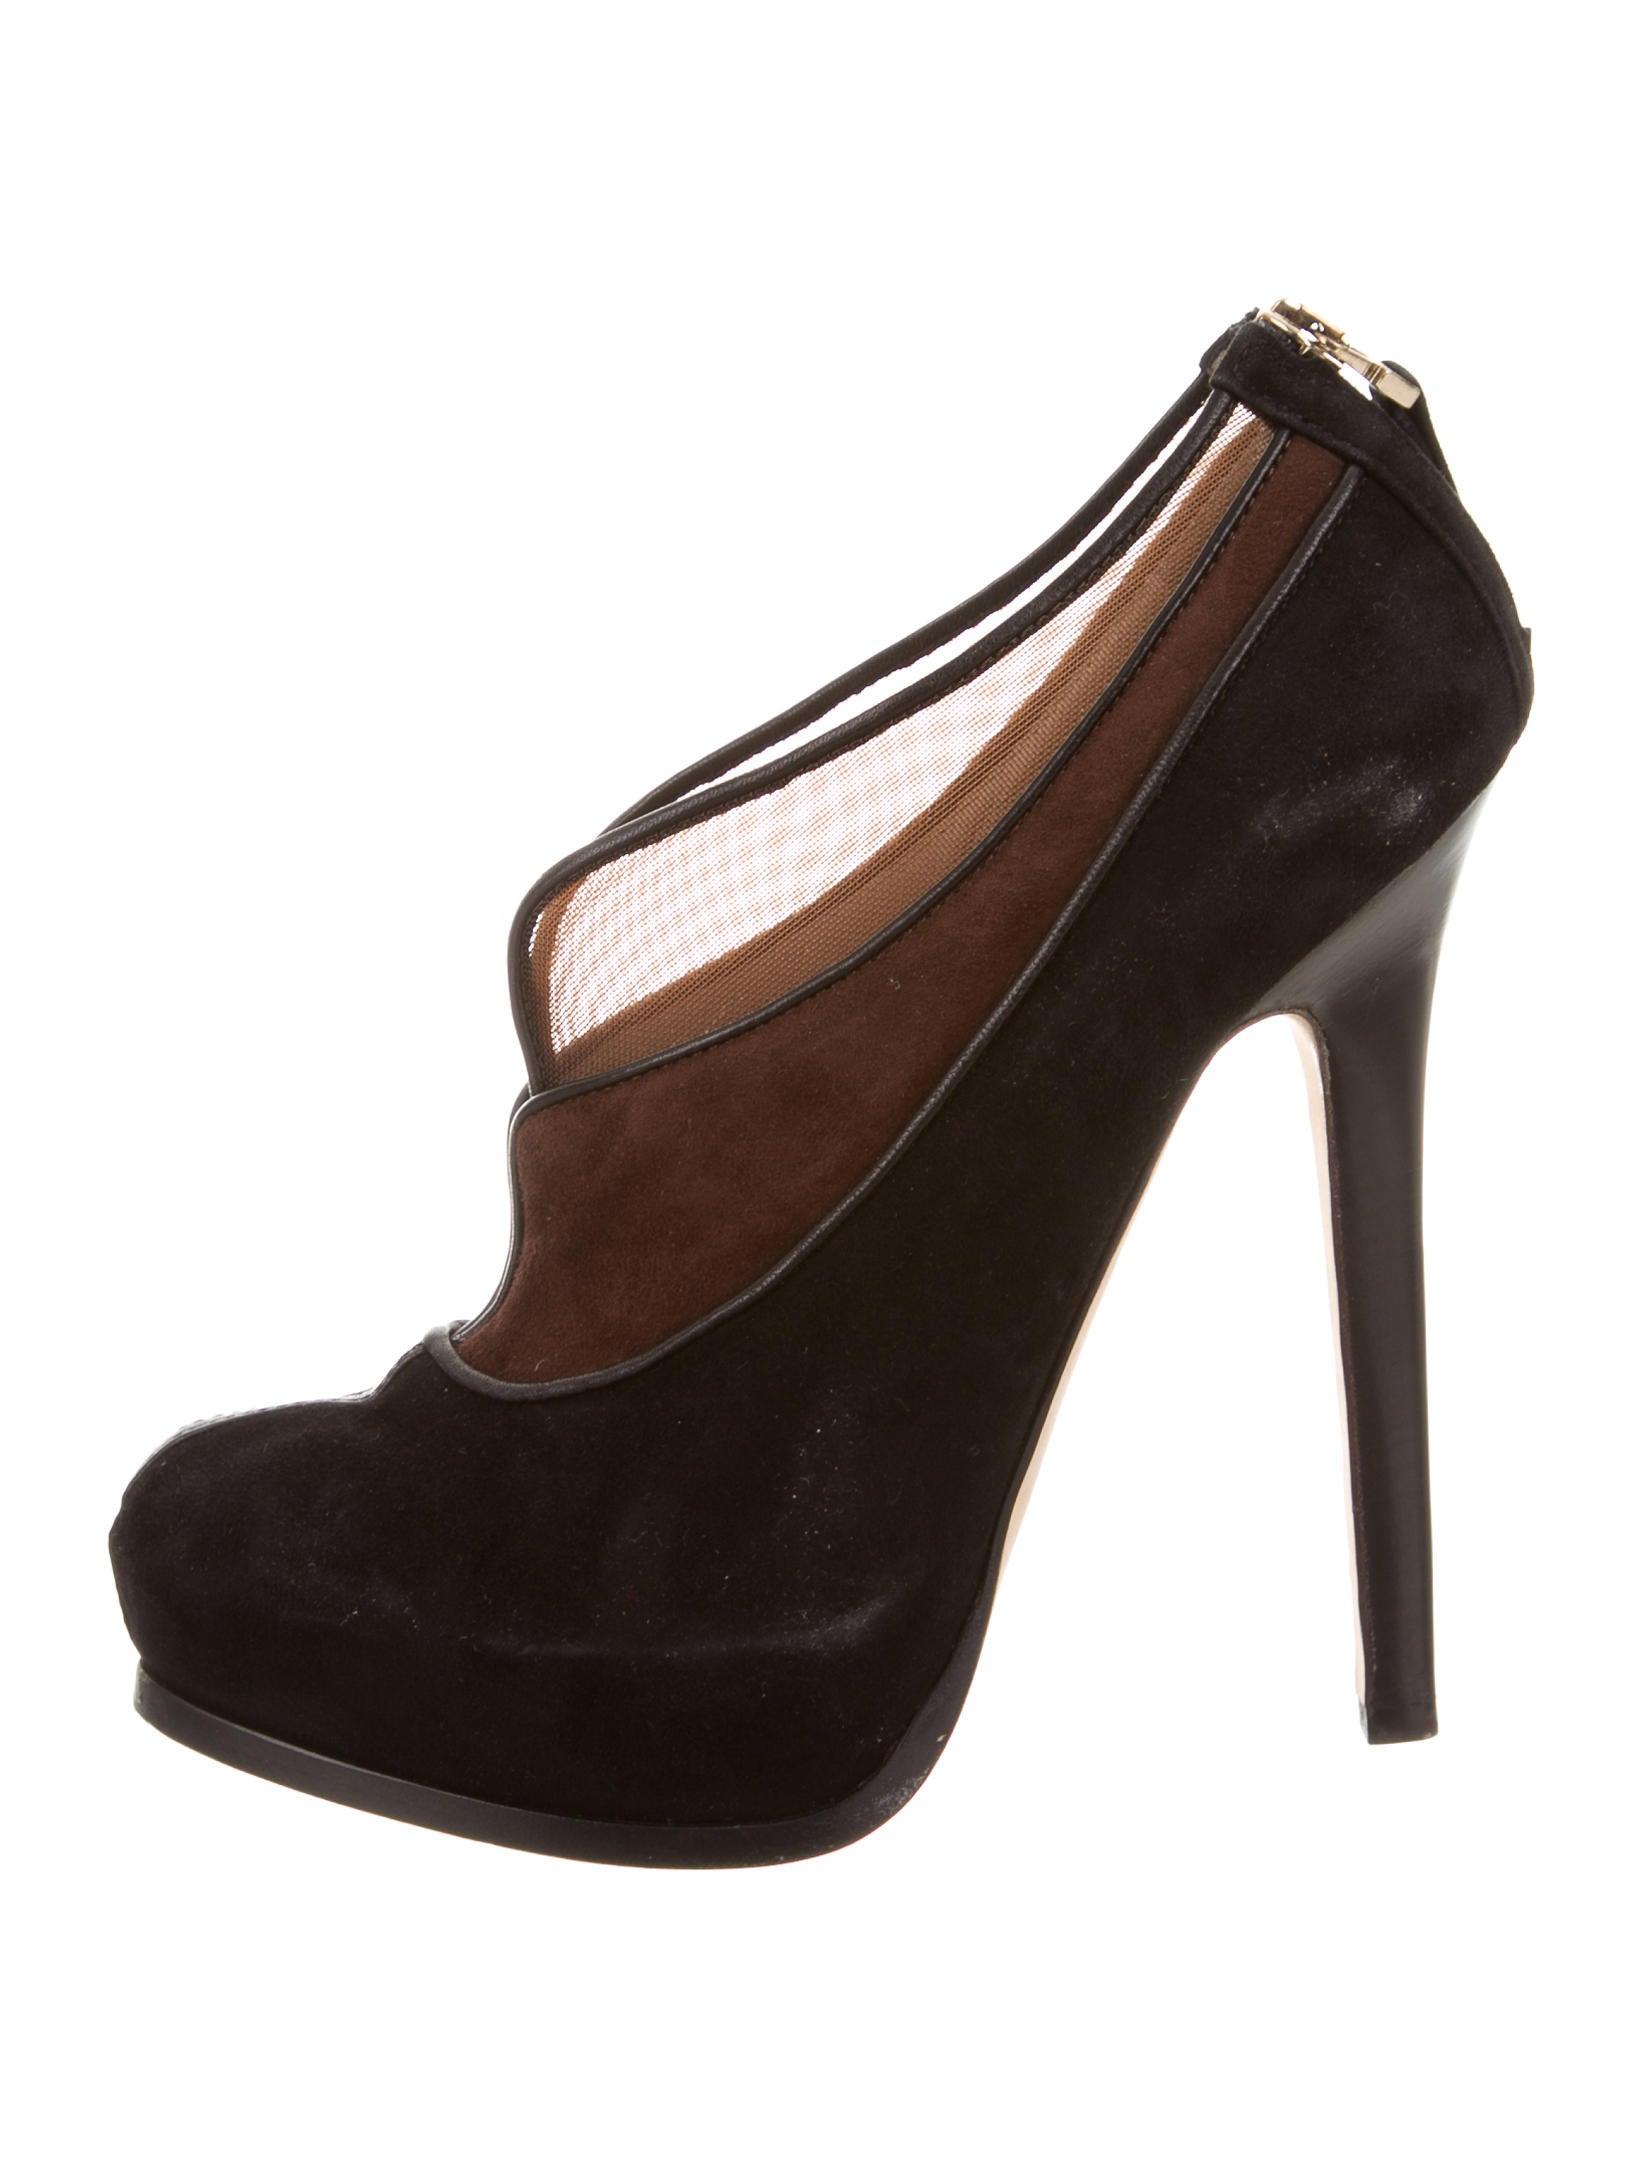 fendi mesh accented platform ankle boots shoes